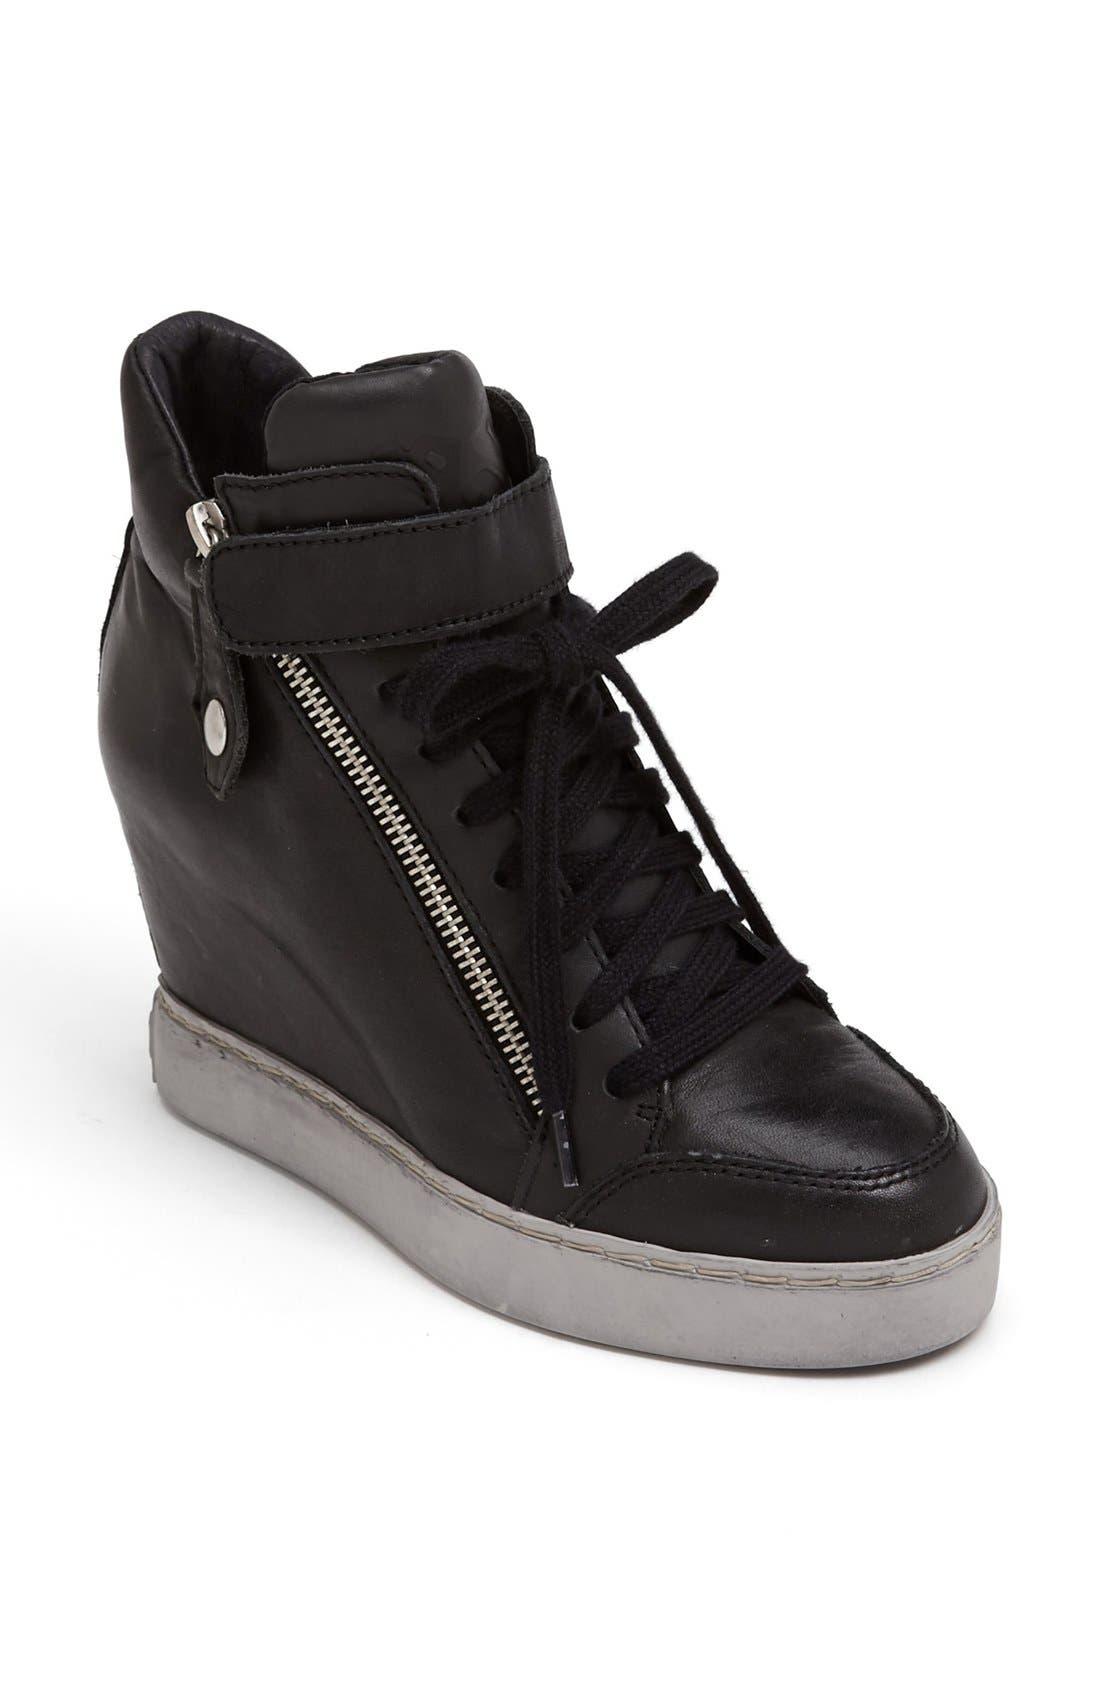 Alternate Image 1 Selected - Ash 'Body' Wedge Sneaker